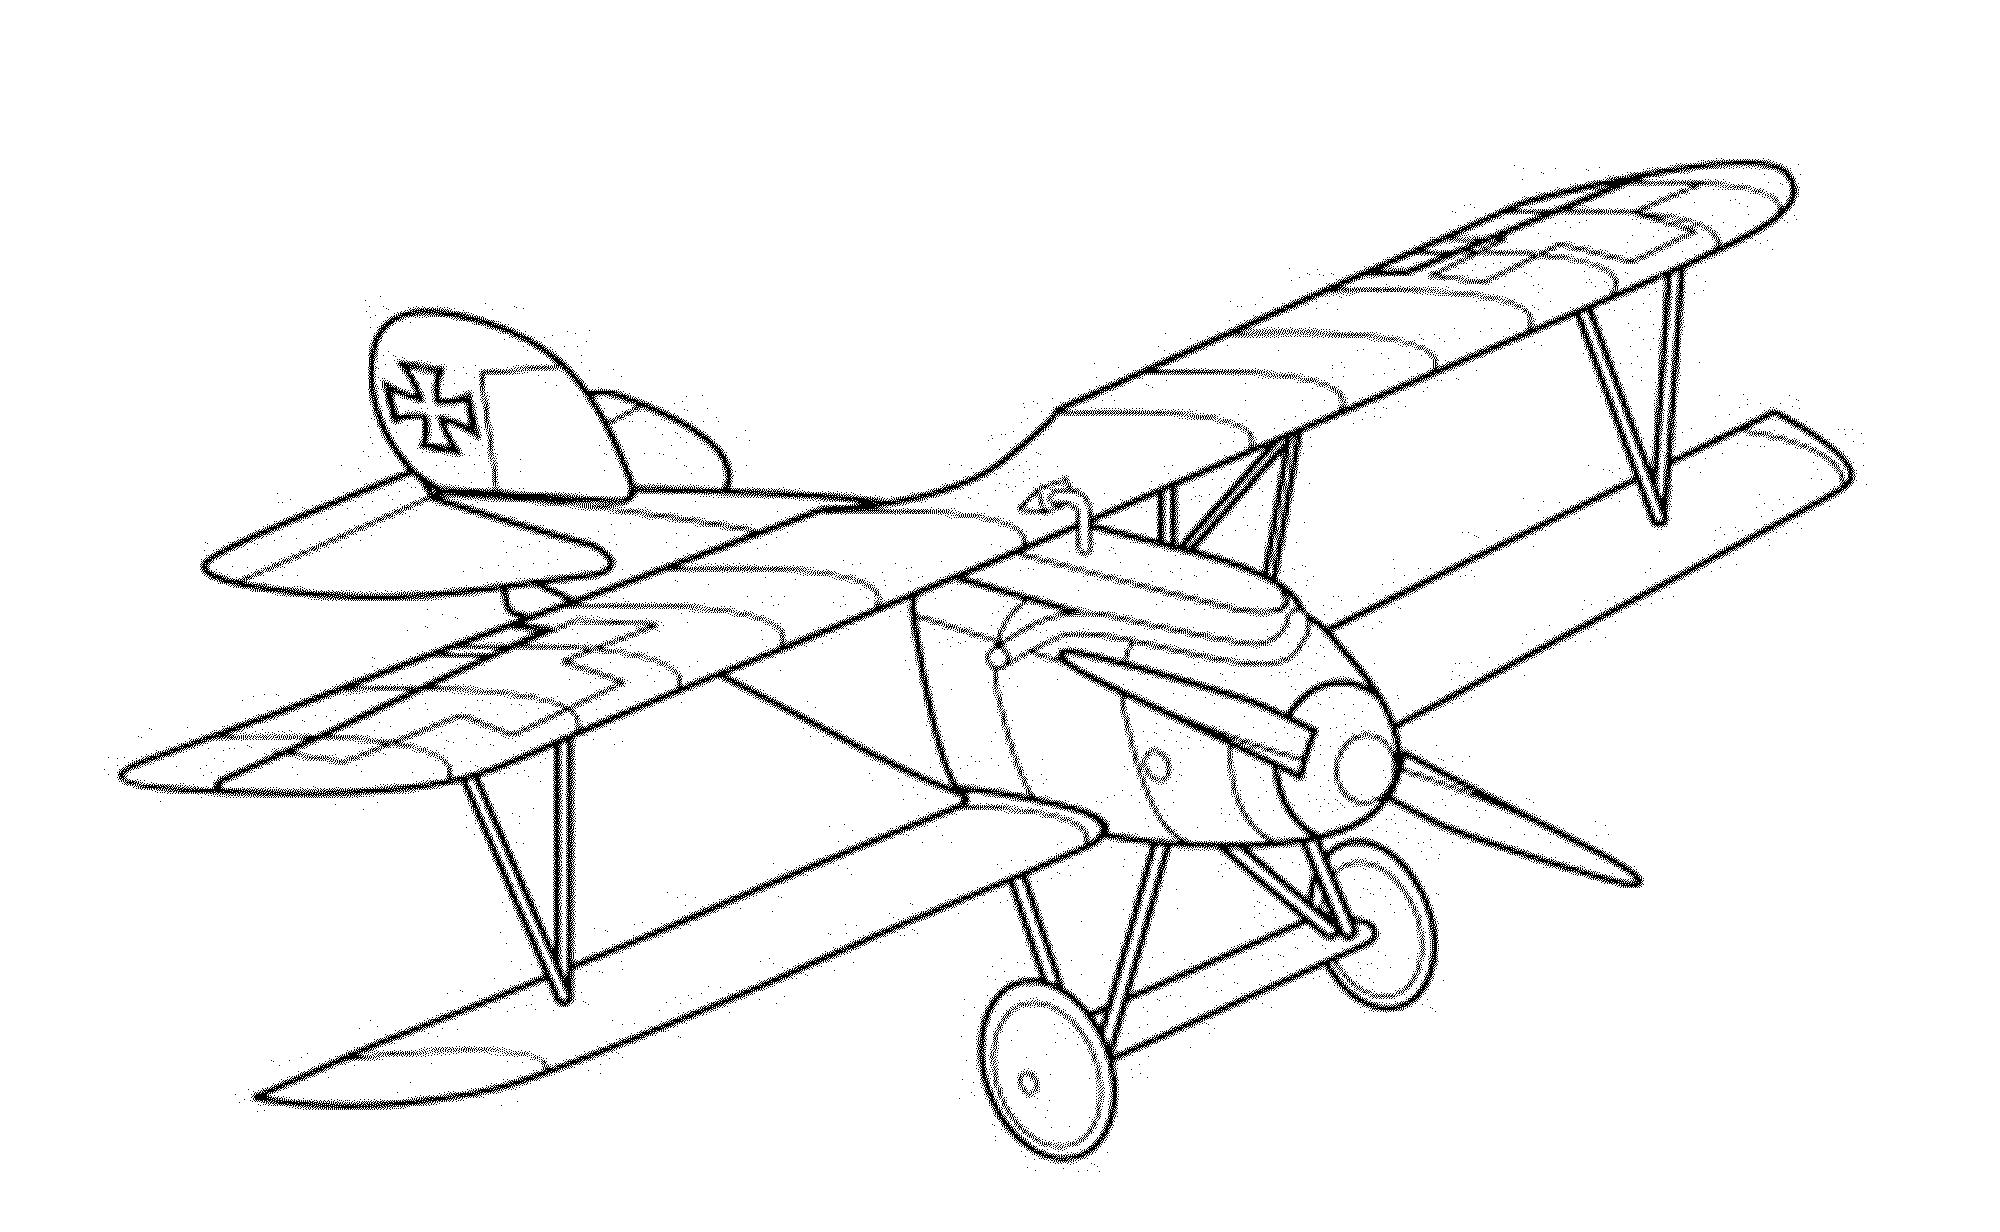 coloring page airplane free printable airplane coloring pages for kids page coloring airplane